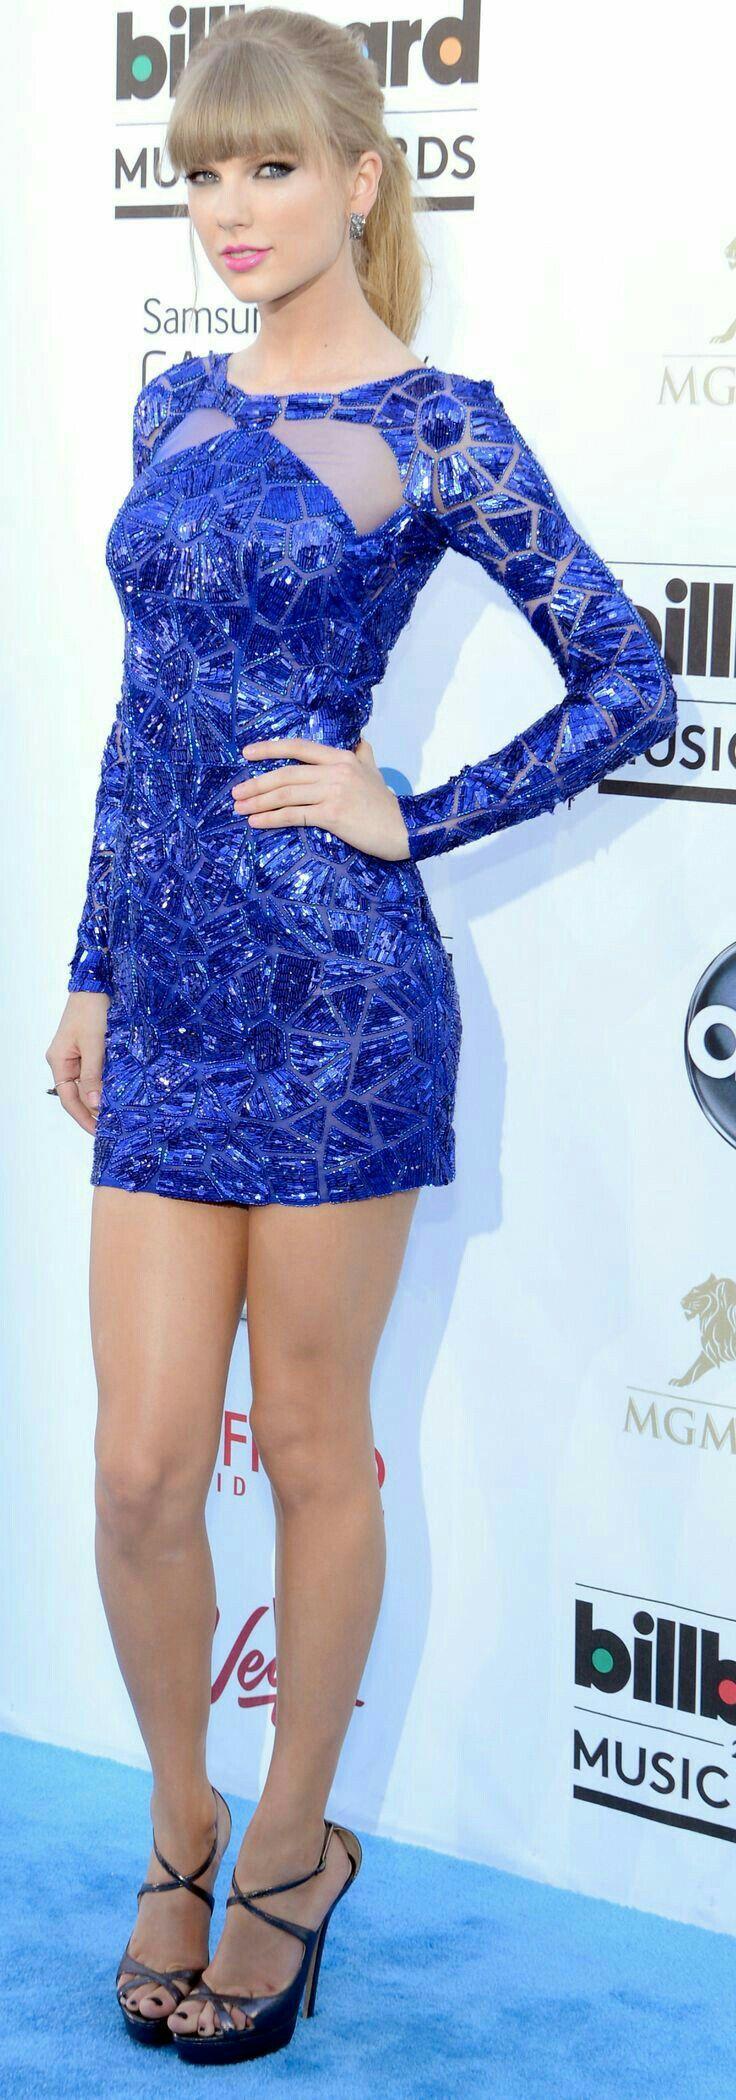 Taylor Swift @taylorswift13 @taylorswift #taylorswift